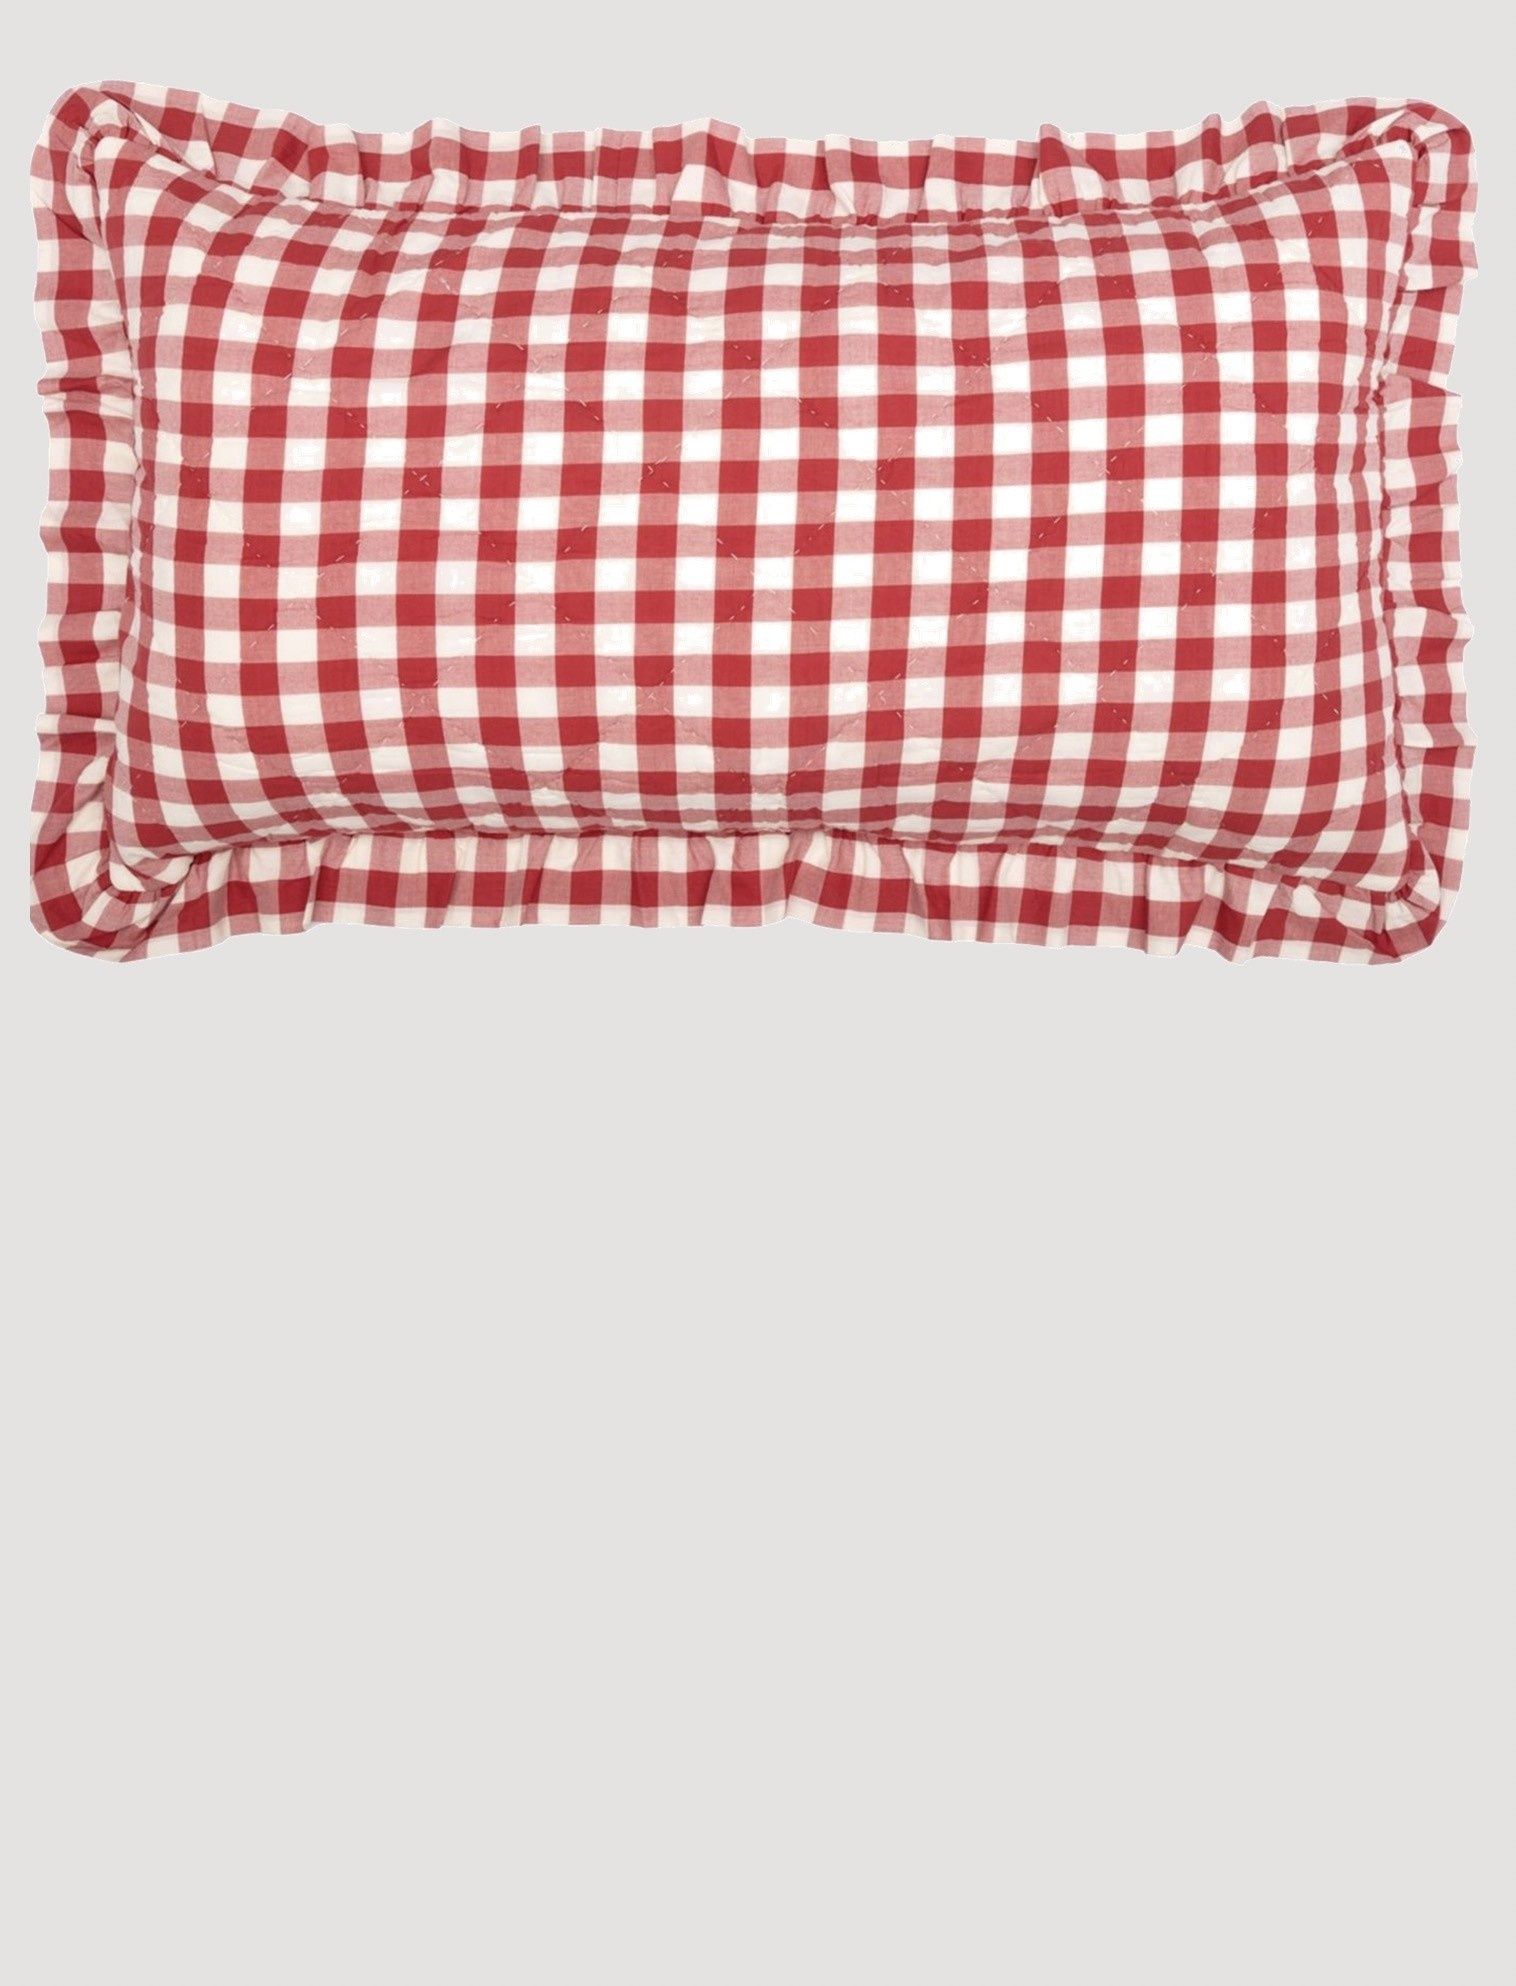 VHC Brands Annie Buffalo Red Check Ruffled Sham